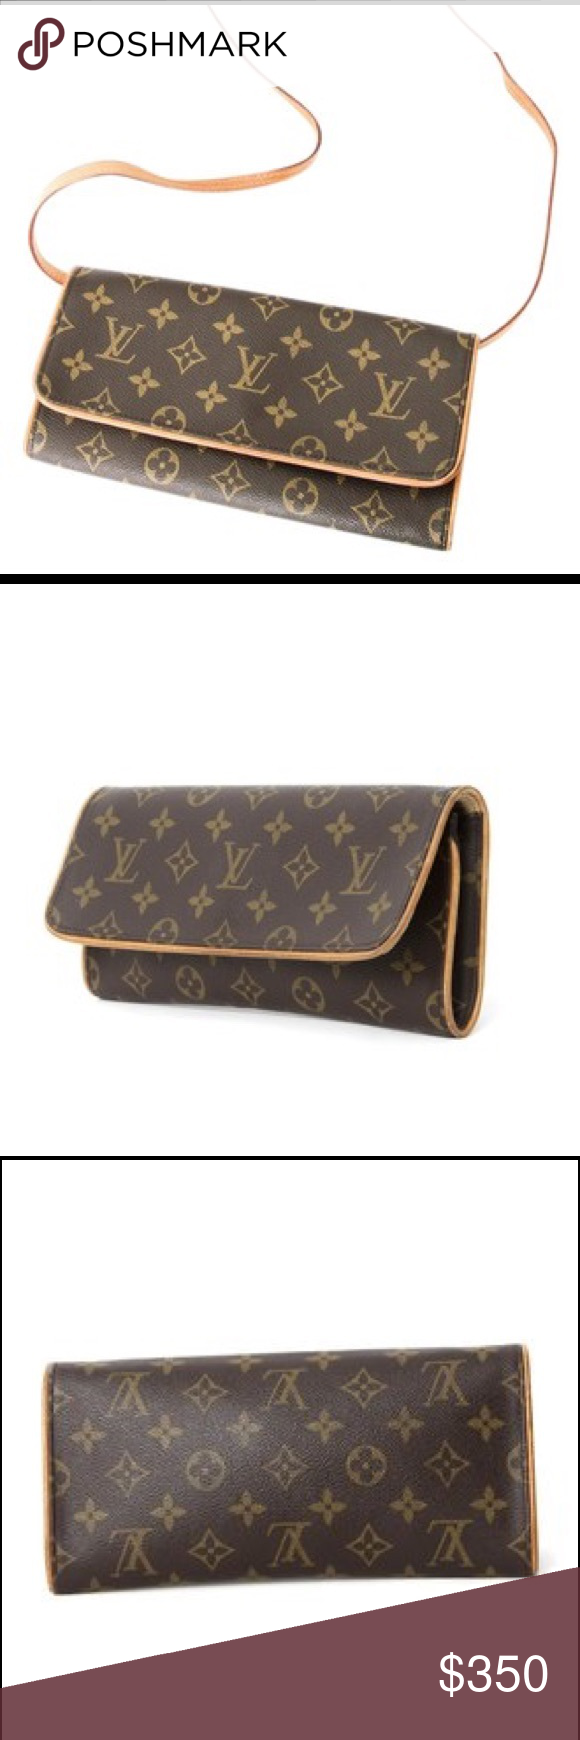 53be73e6721ba Louis Vuitton Pochette Twin Monogram Crossbody Bag 100% authentic LV  pre-owned bag in